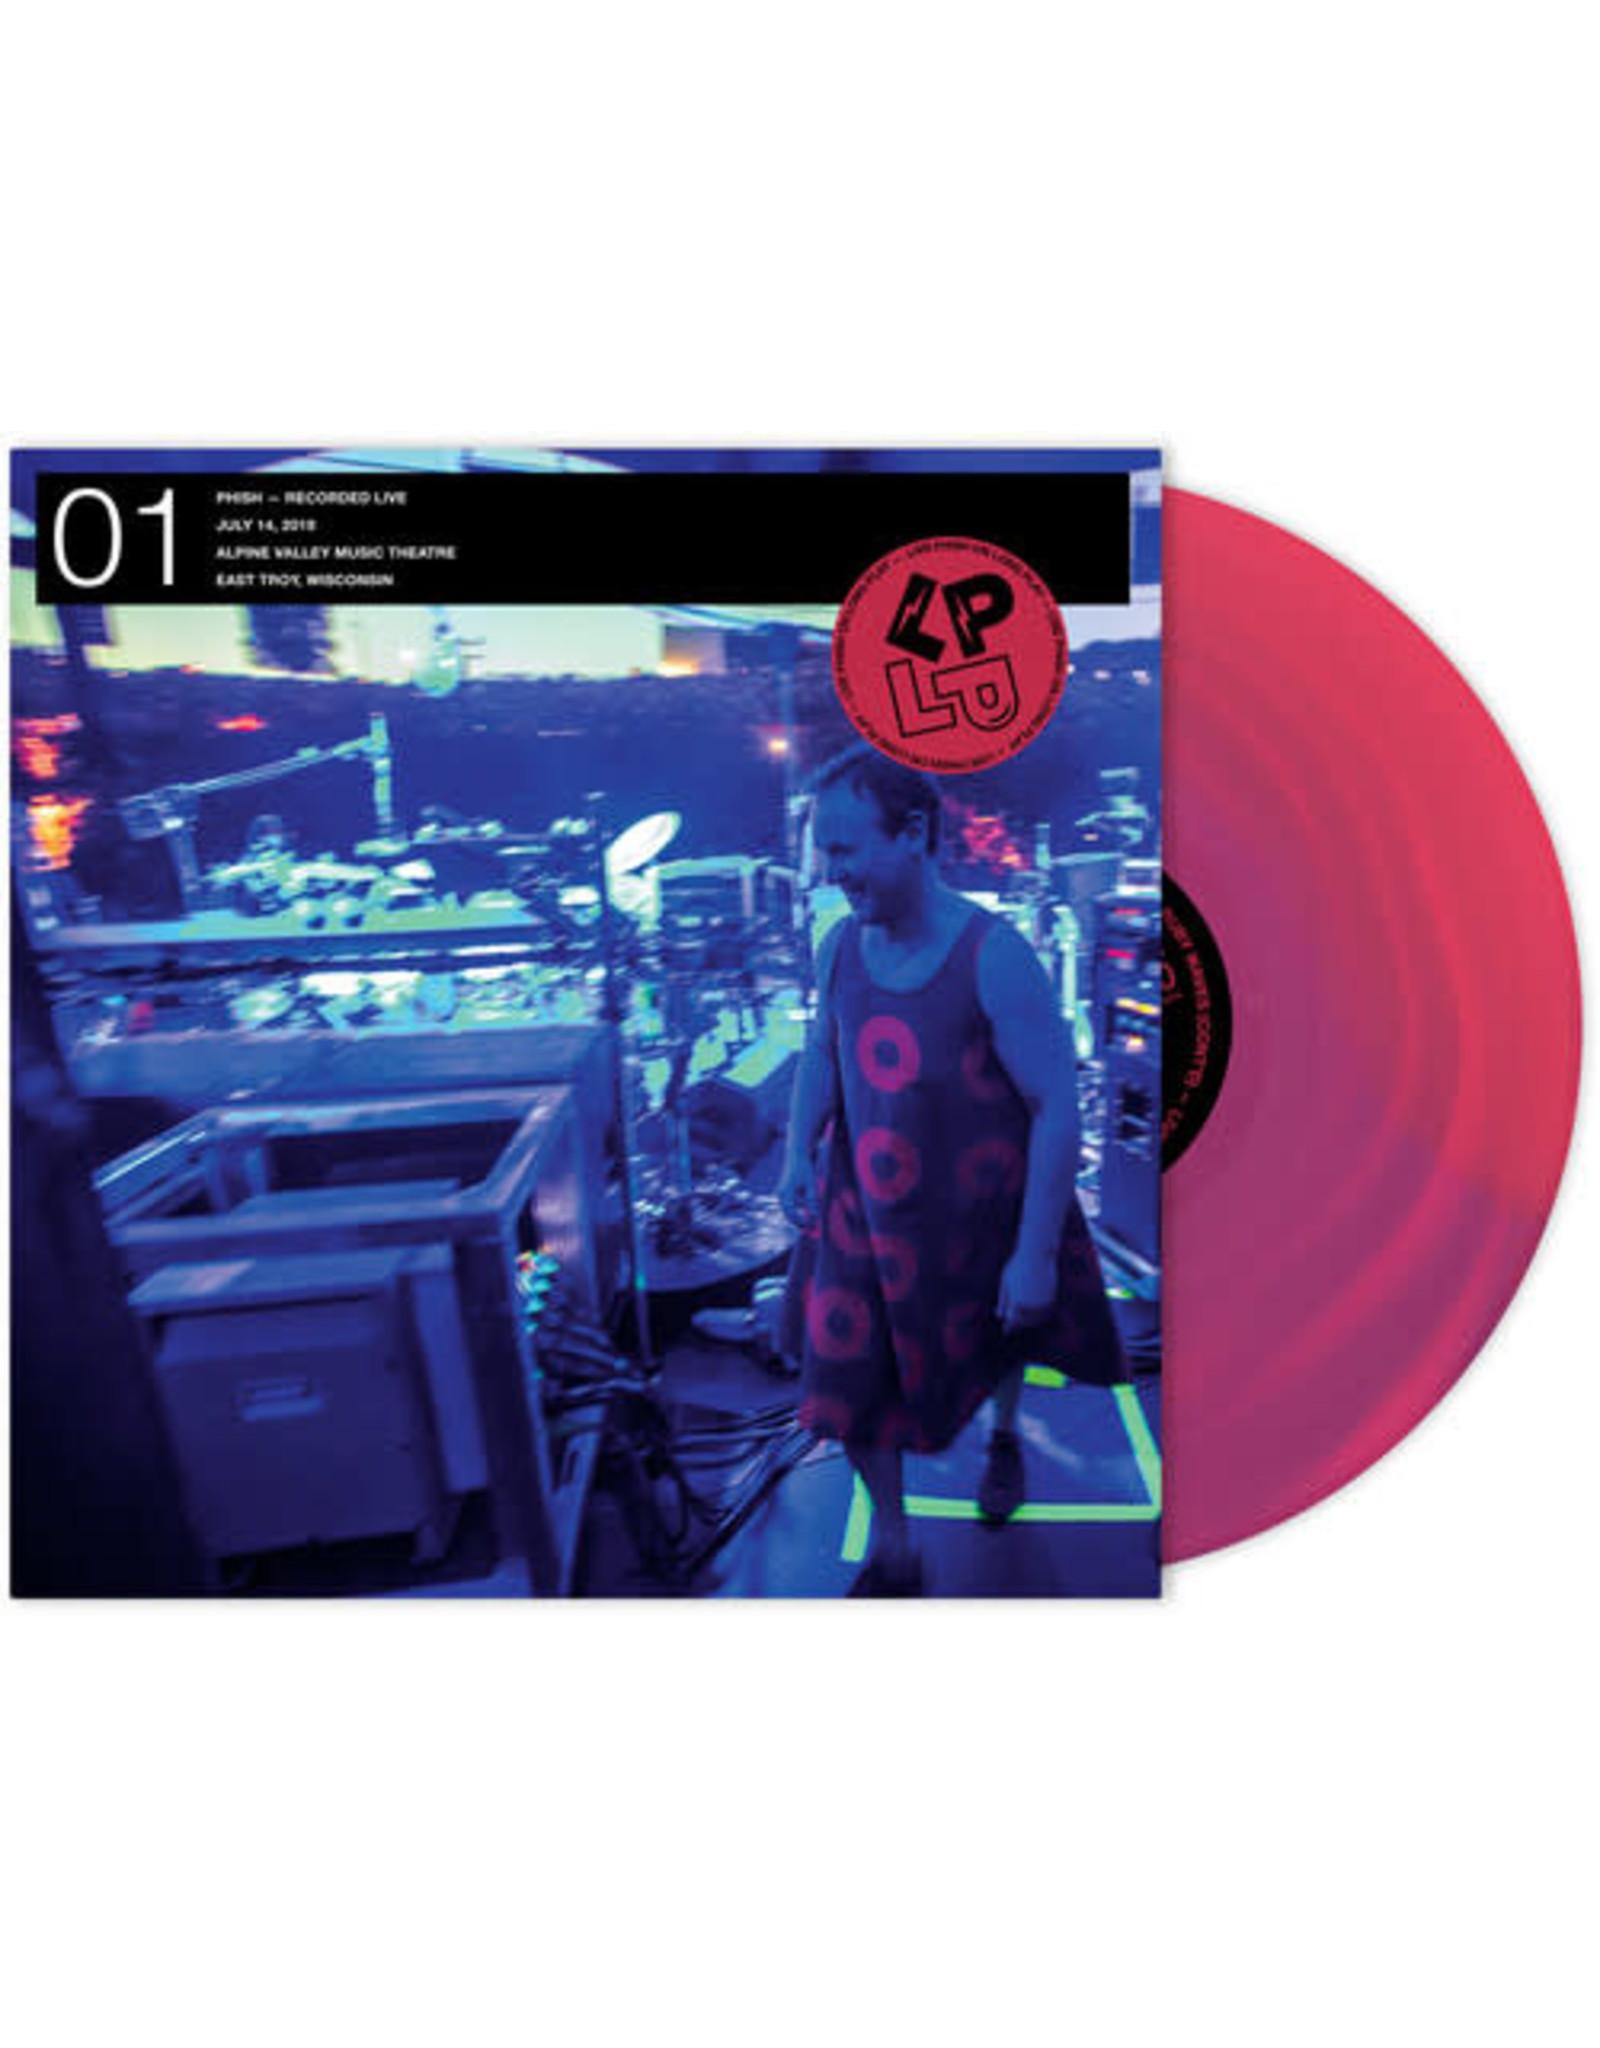 New Vinyl Phish - LP On LP 01: Ruby Waves 7/ 14/ 19 (Colored) LP